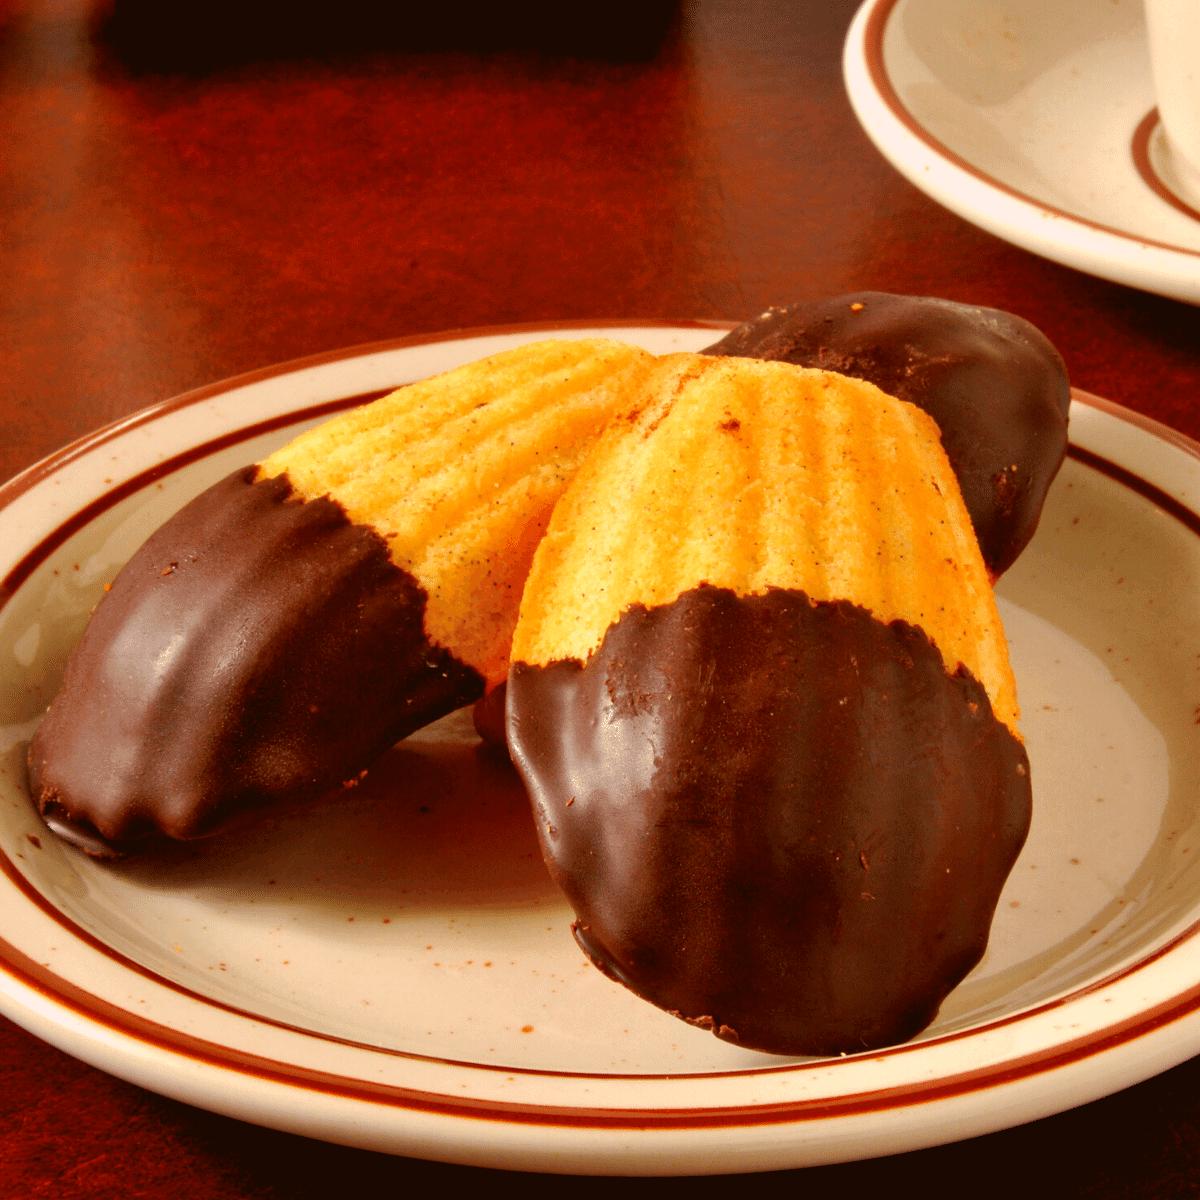 Low Carb Orange Madeleines FI